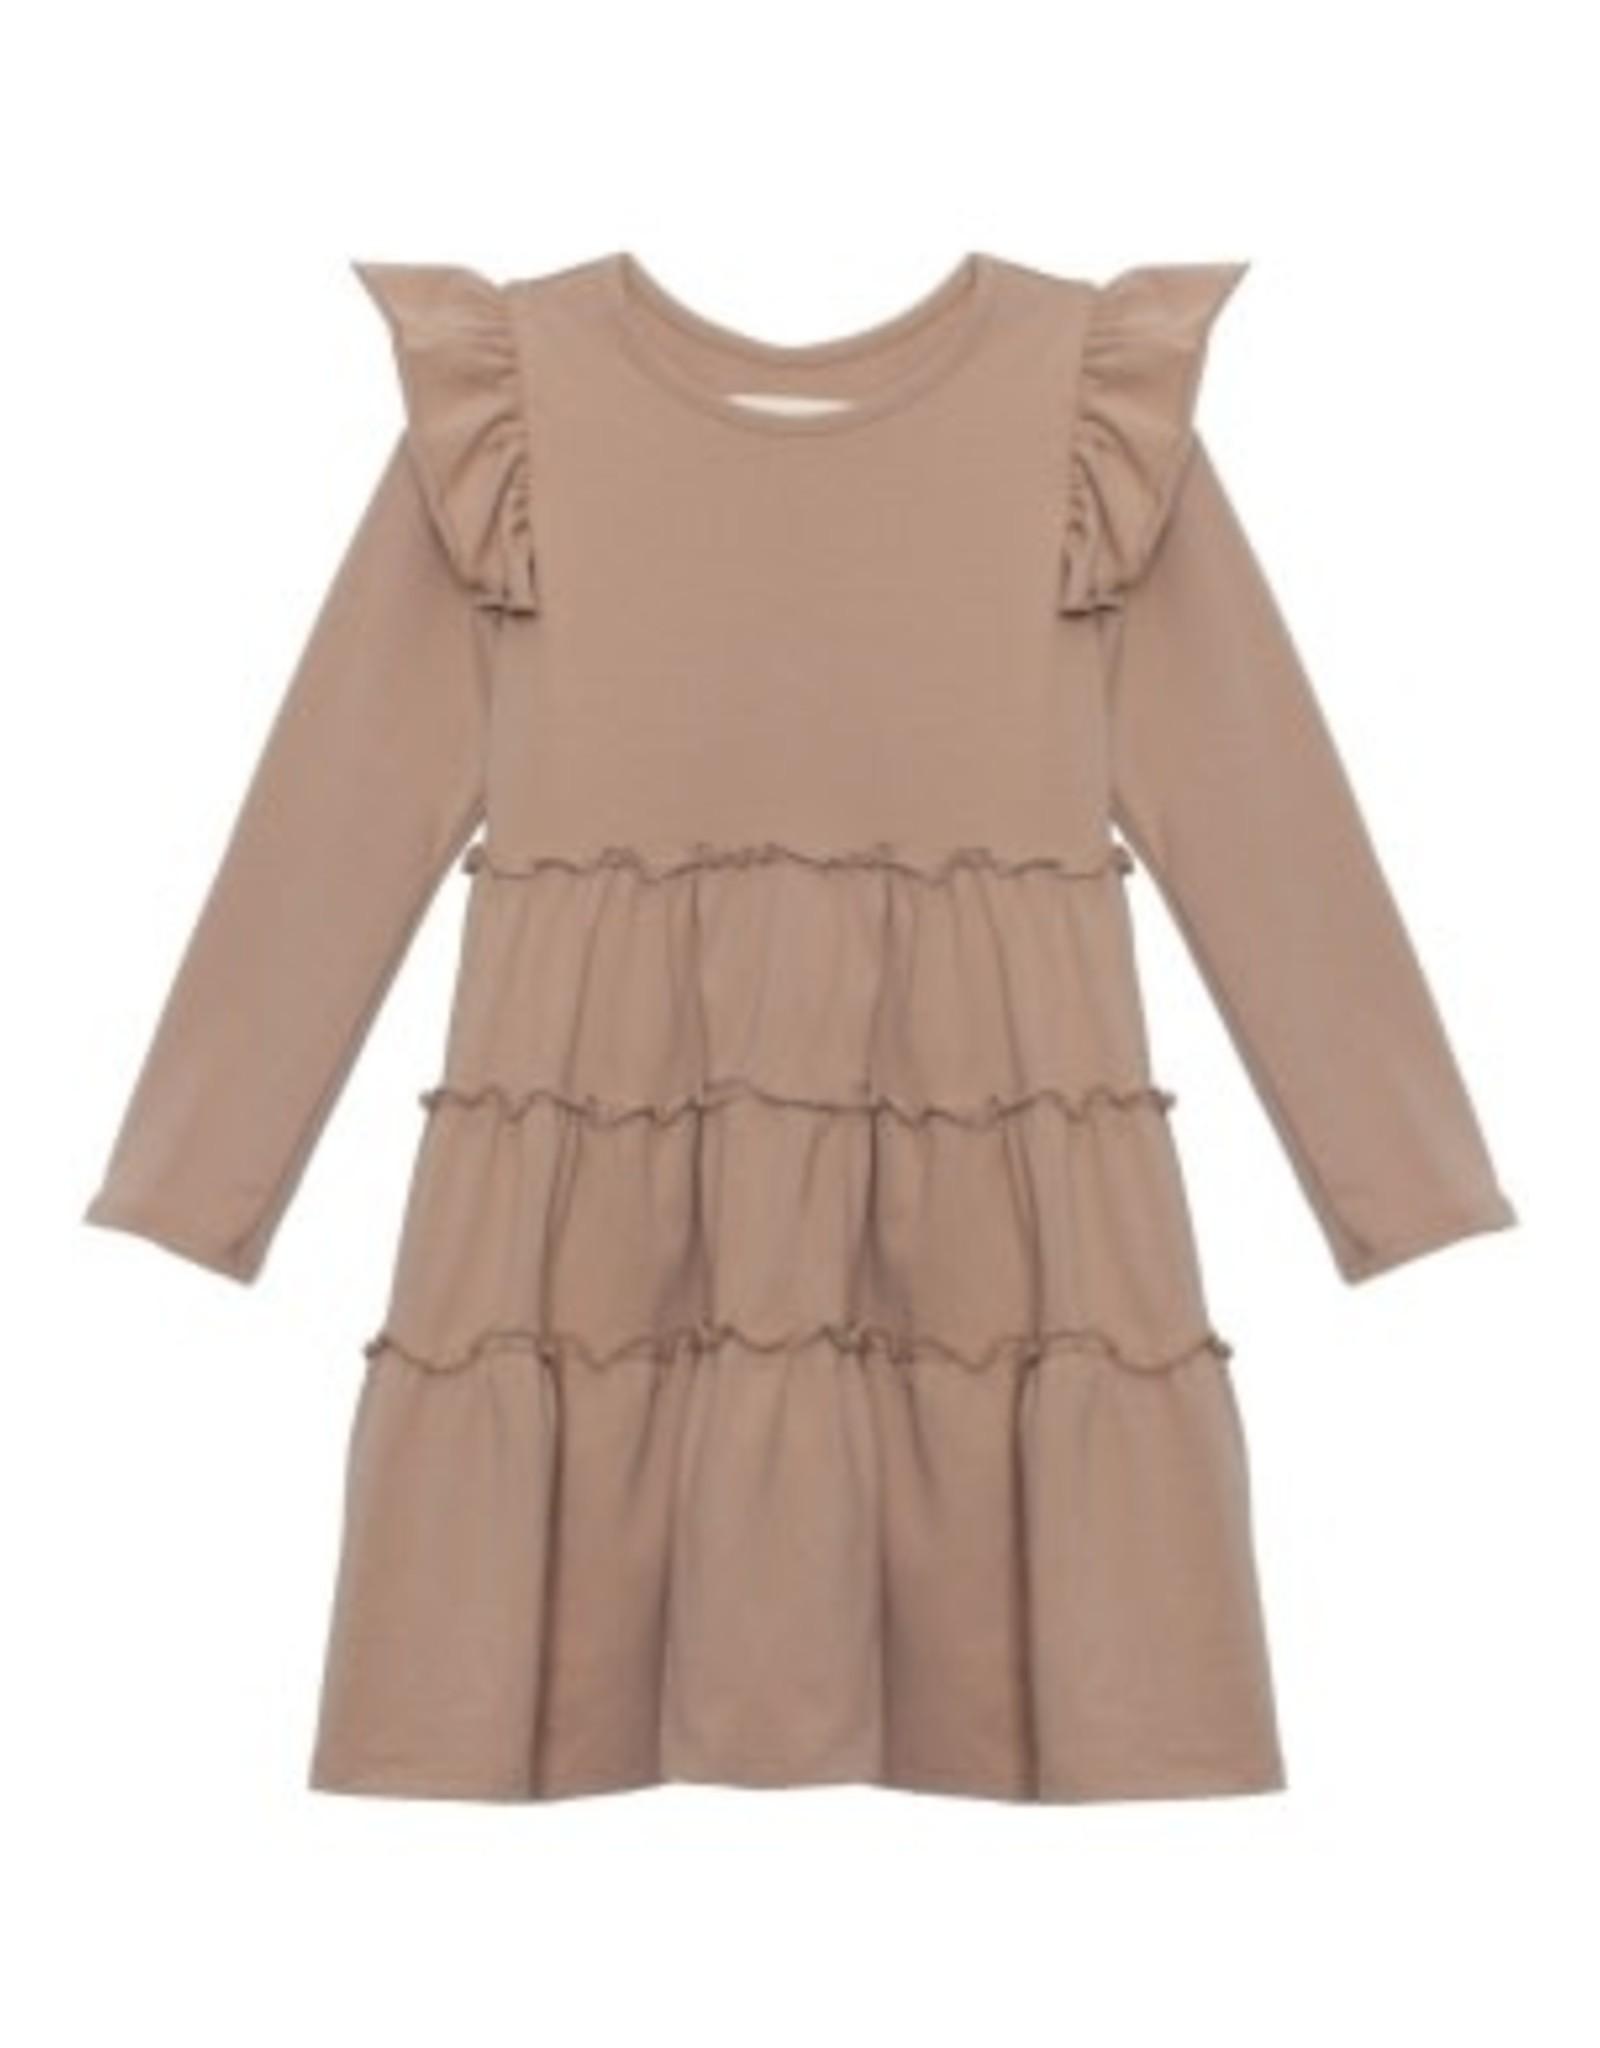 Mabel & Honey Mabel & Honey- LS Brown Knit Dress